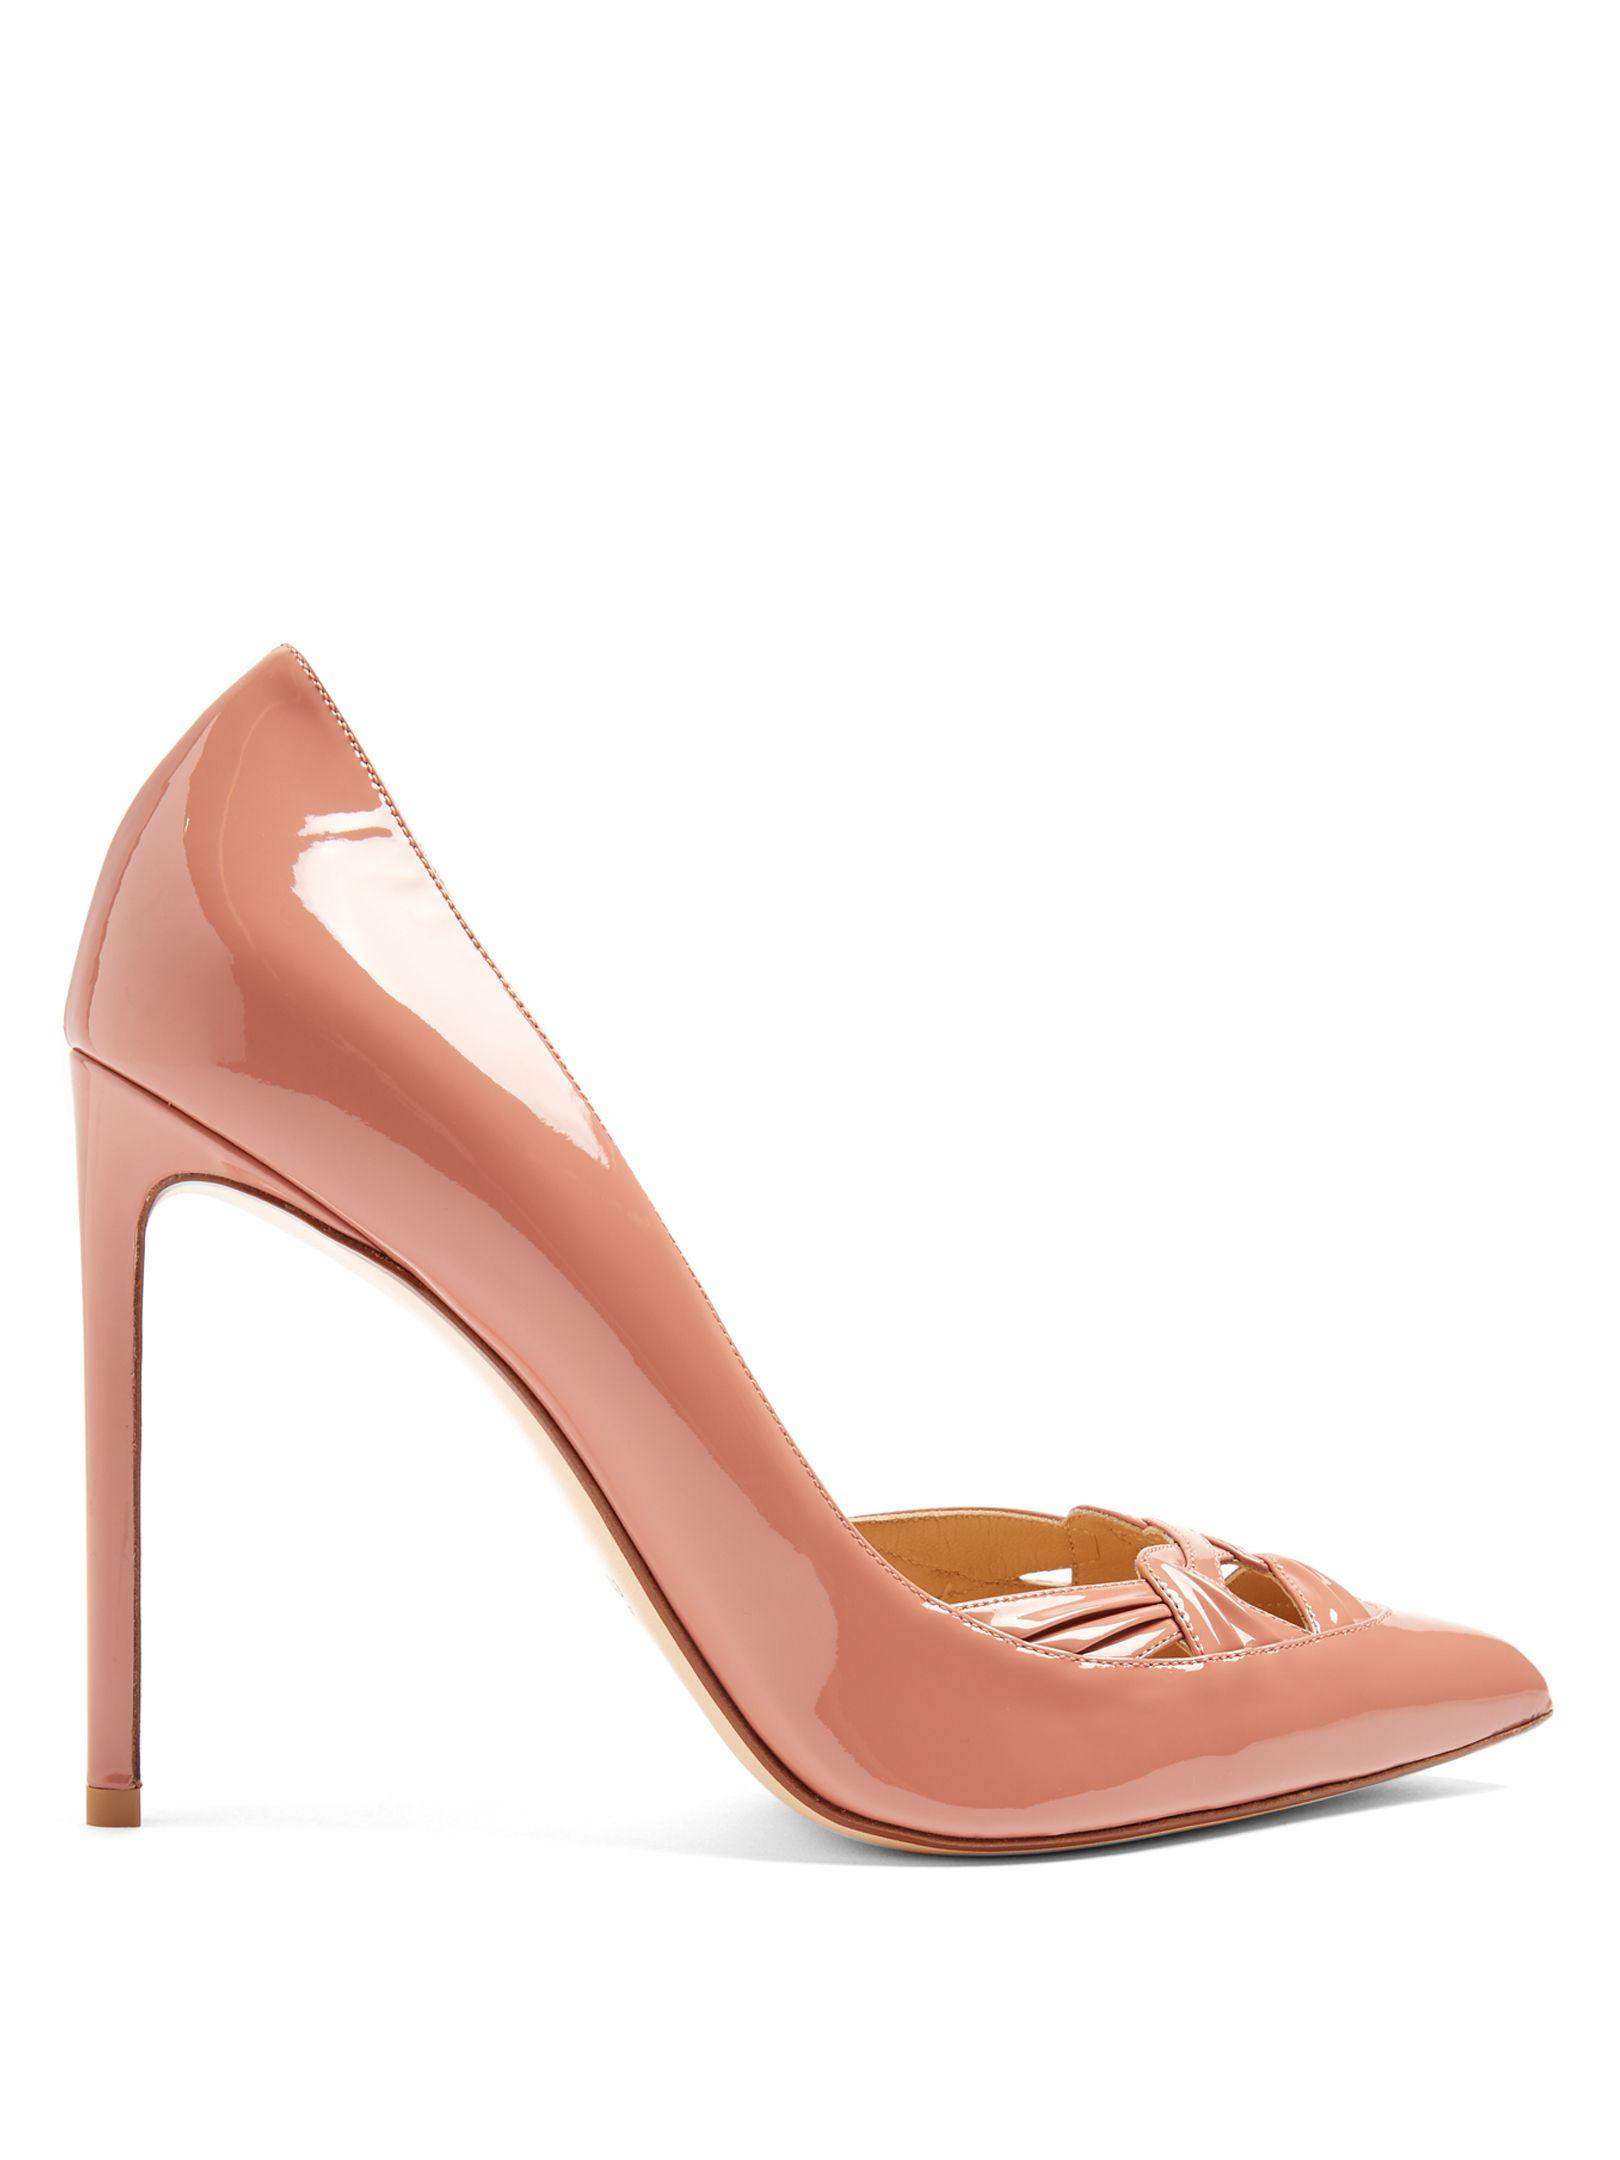 b53bf324b Point-toe patent-leather pumps | Francesco Russo | MATCHESFASHION.COM UK